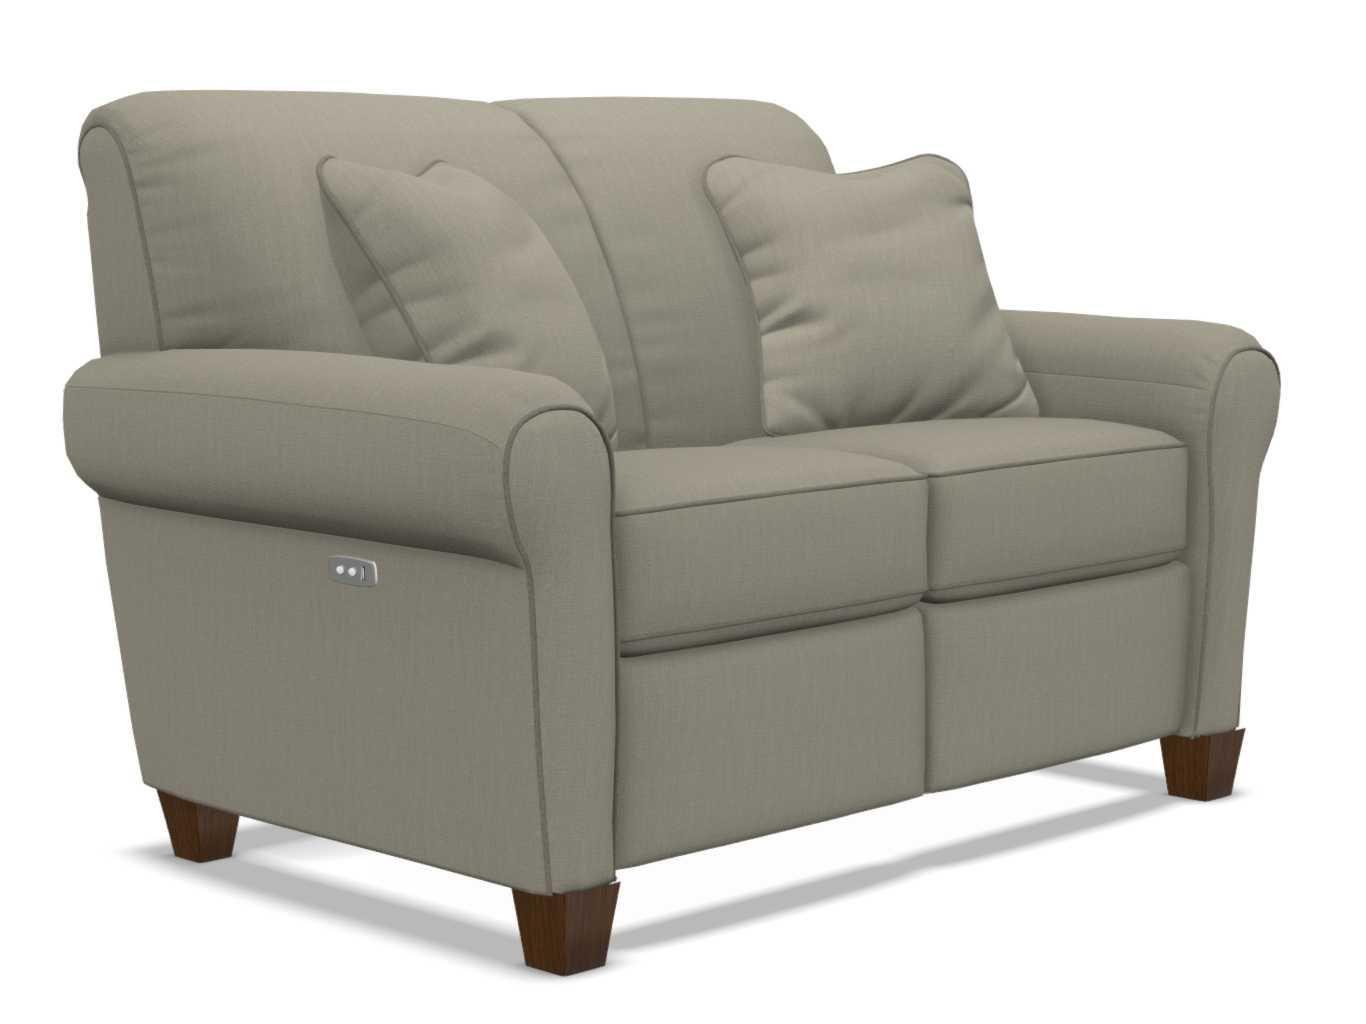 Bennett Duo® Reclining Loveseat | Love Seat, Furniture Throughout Bennett Power Reclining Sofas (View 9 of 15)